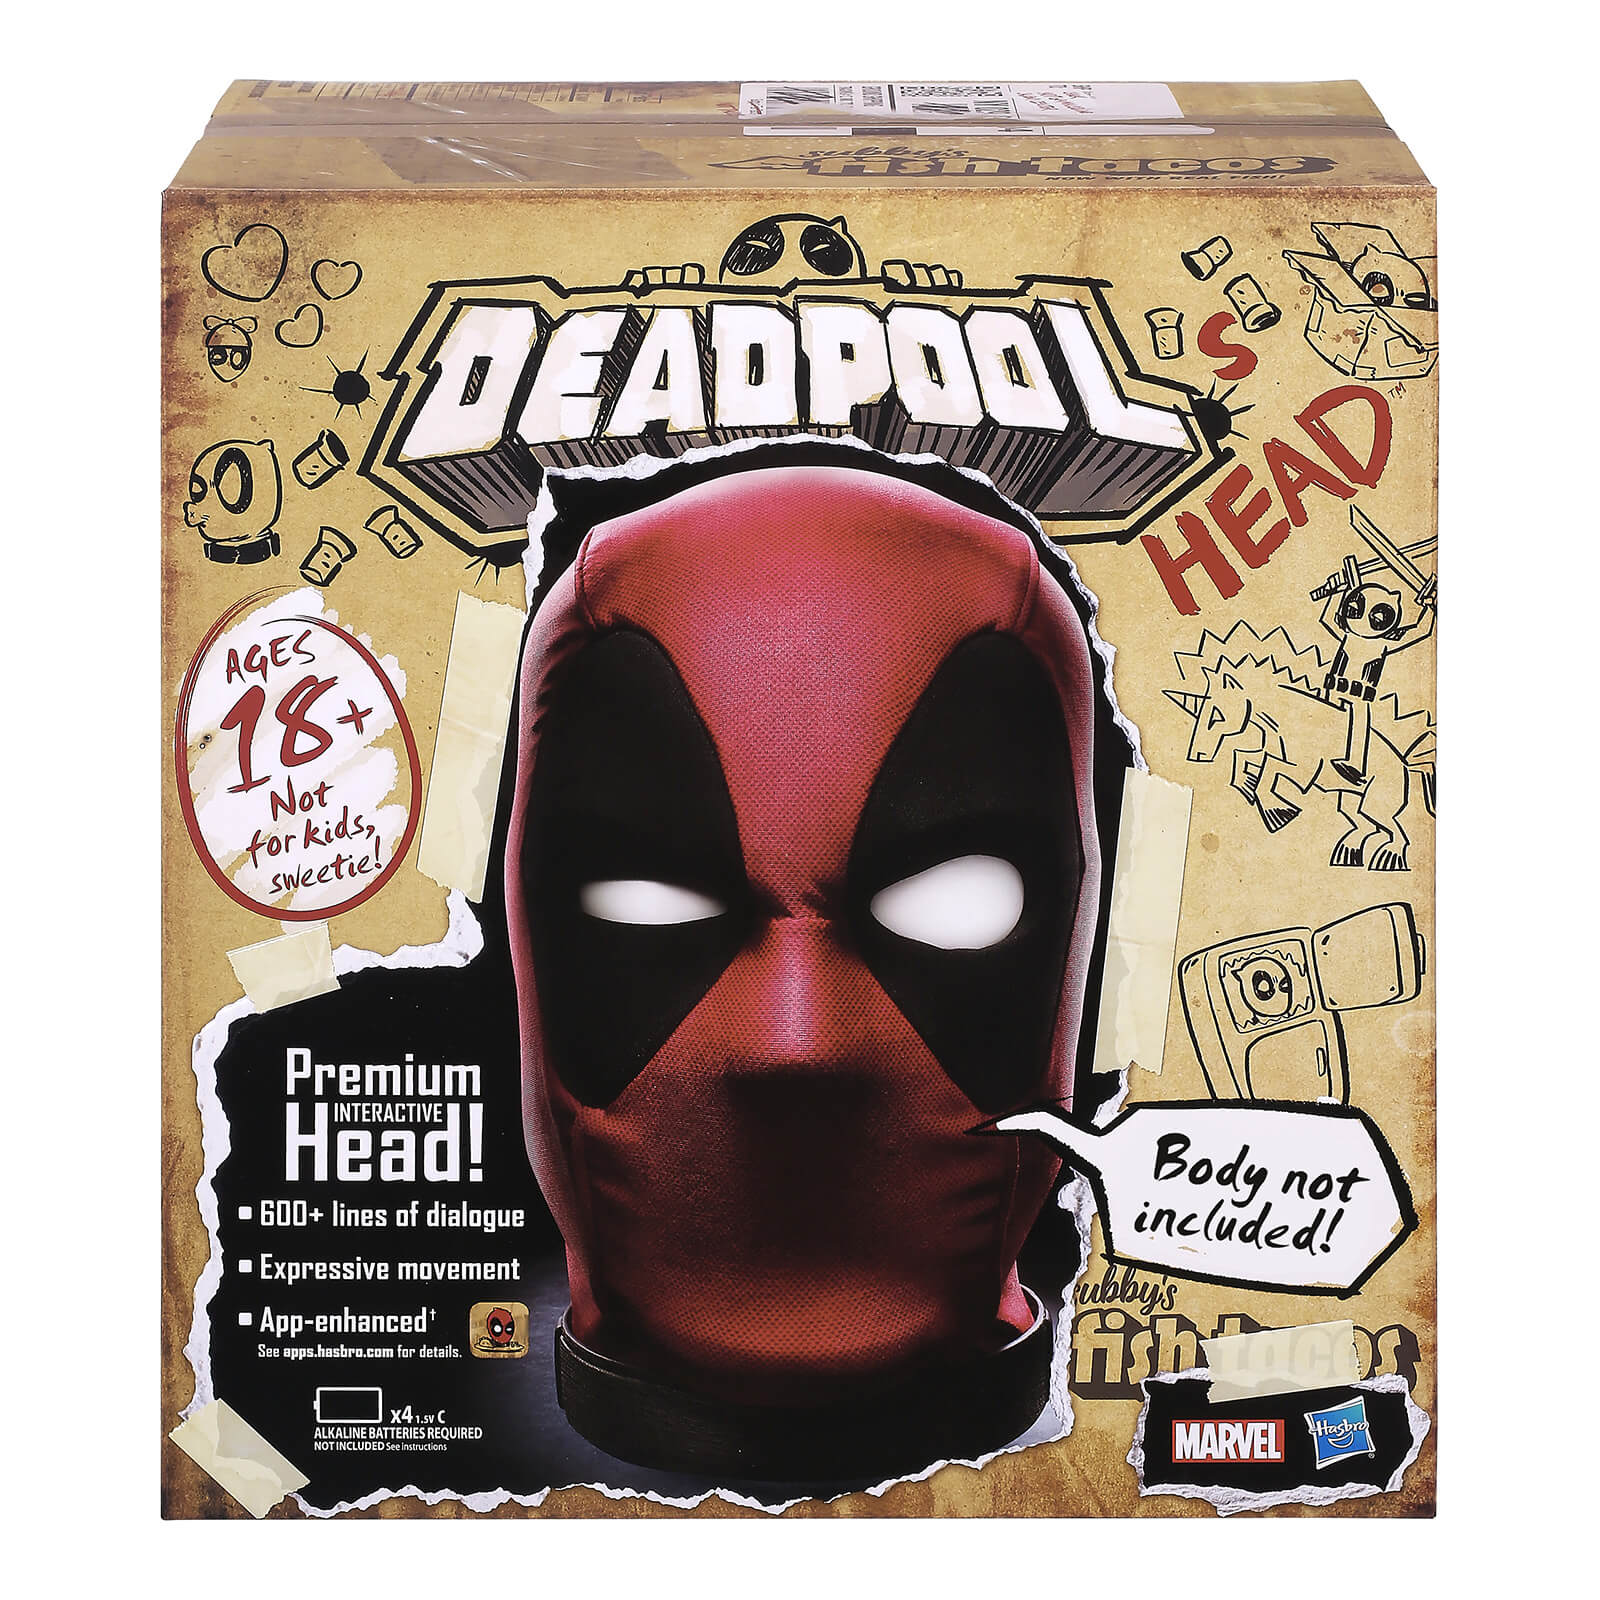 Image of Hasbro Marvel Legends Premium Interactive Deadpool Head